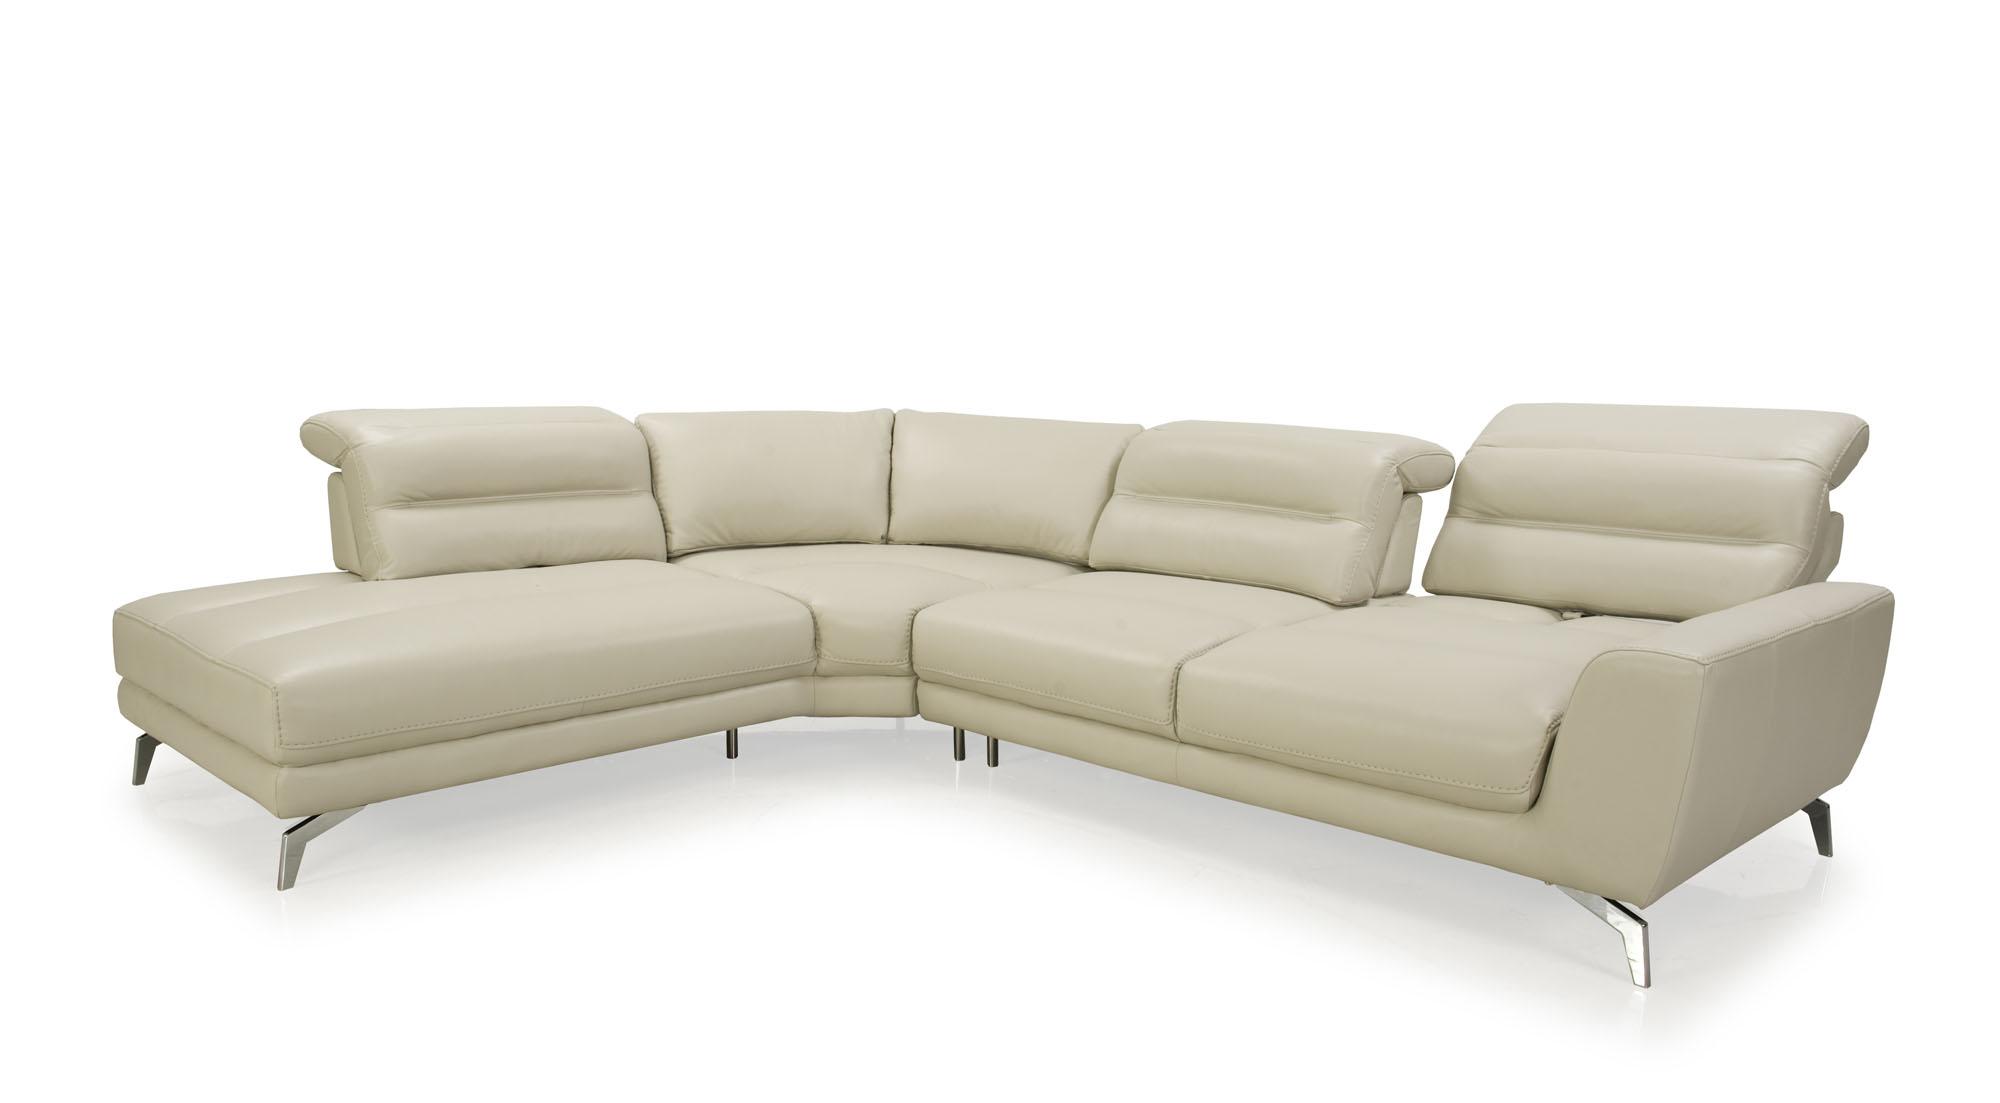 Astounding Advanced Adjustable Top Grain Leather Sectional Creativecarmelina Interior Chair Design Creativecarmelinacom